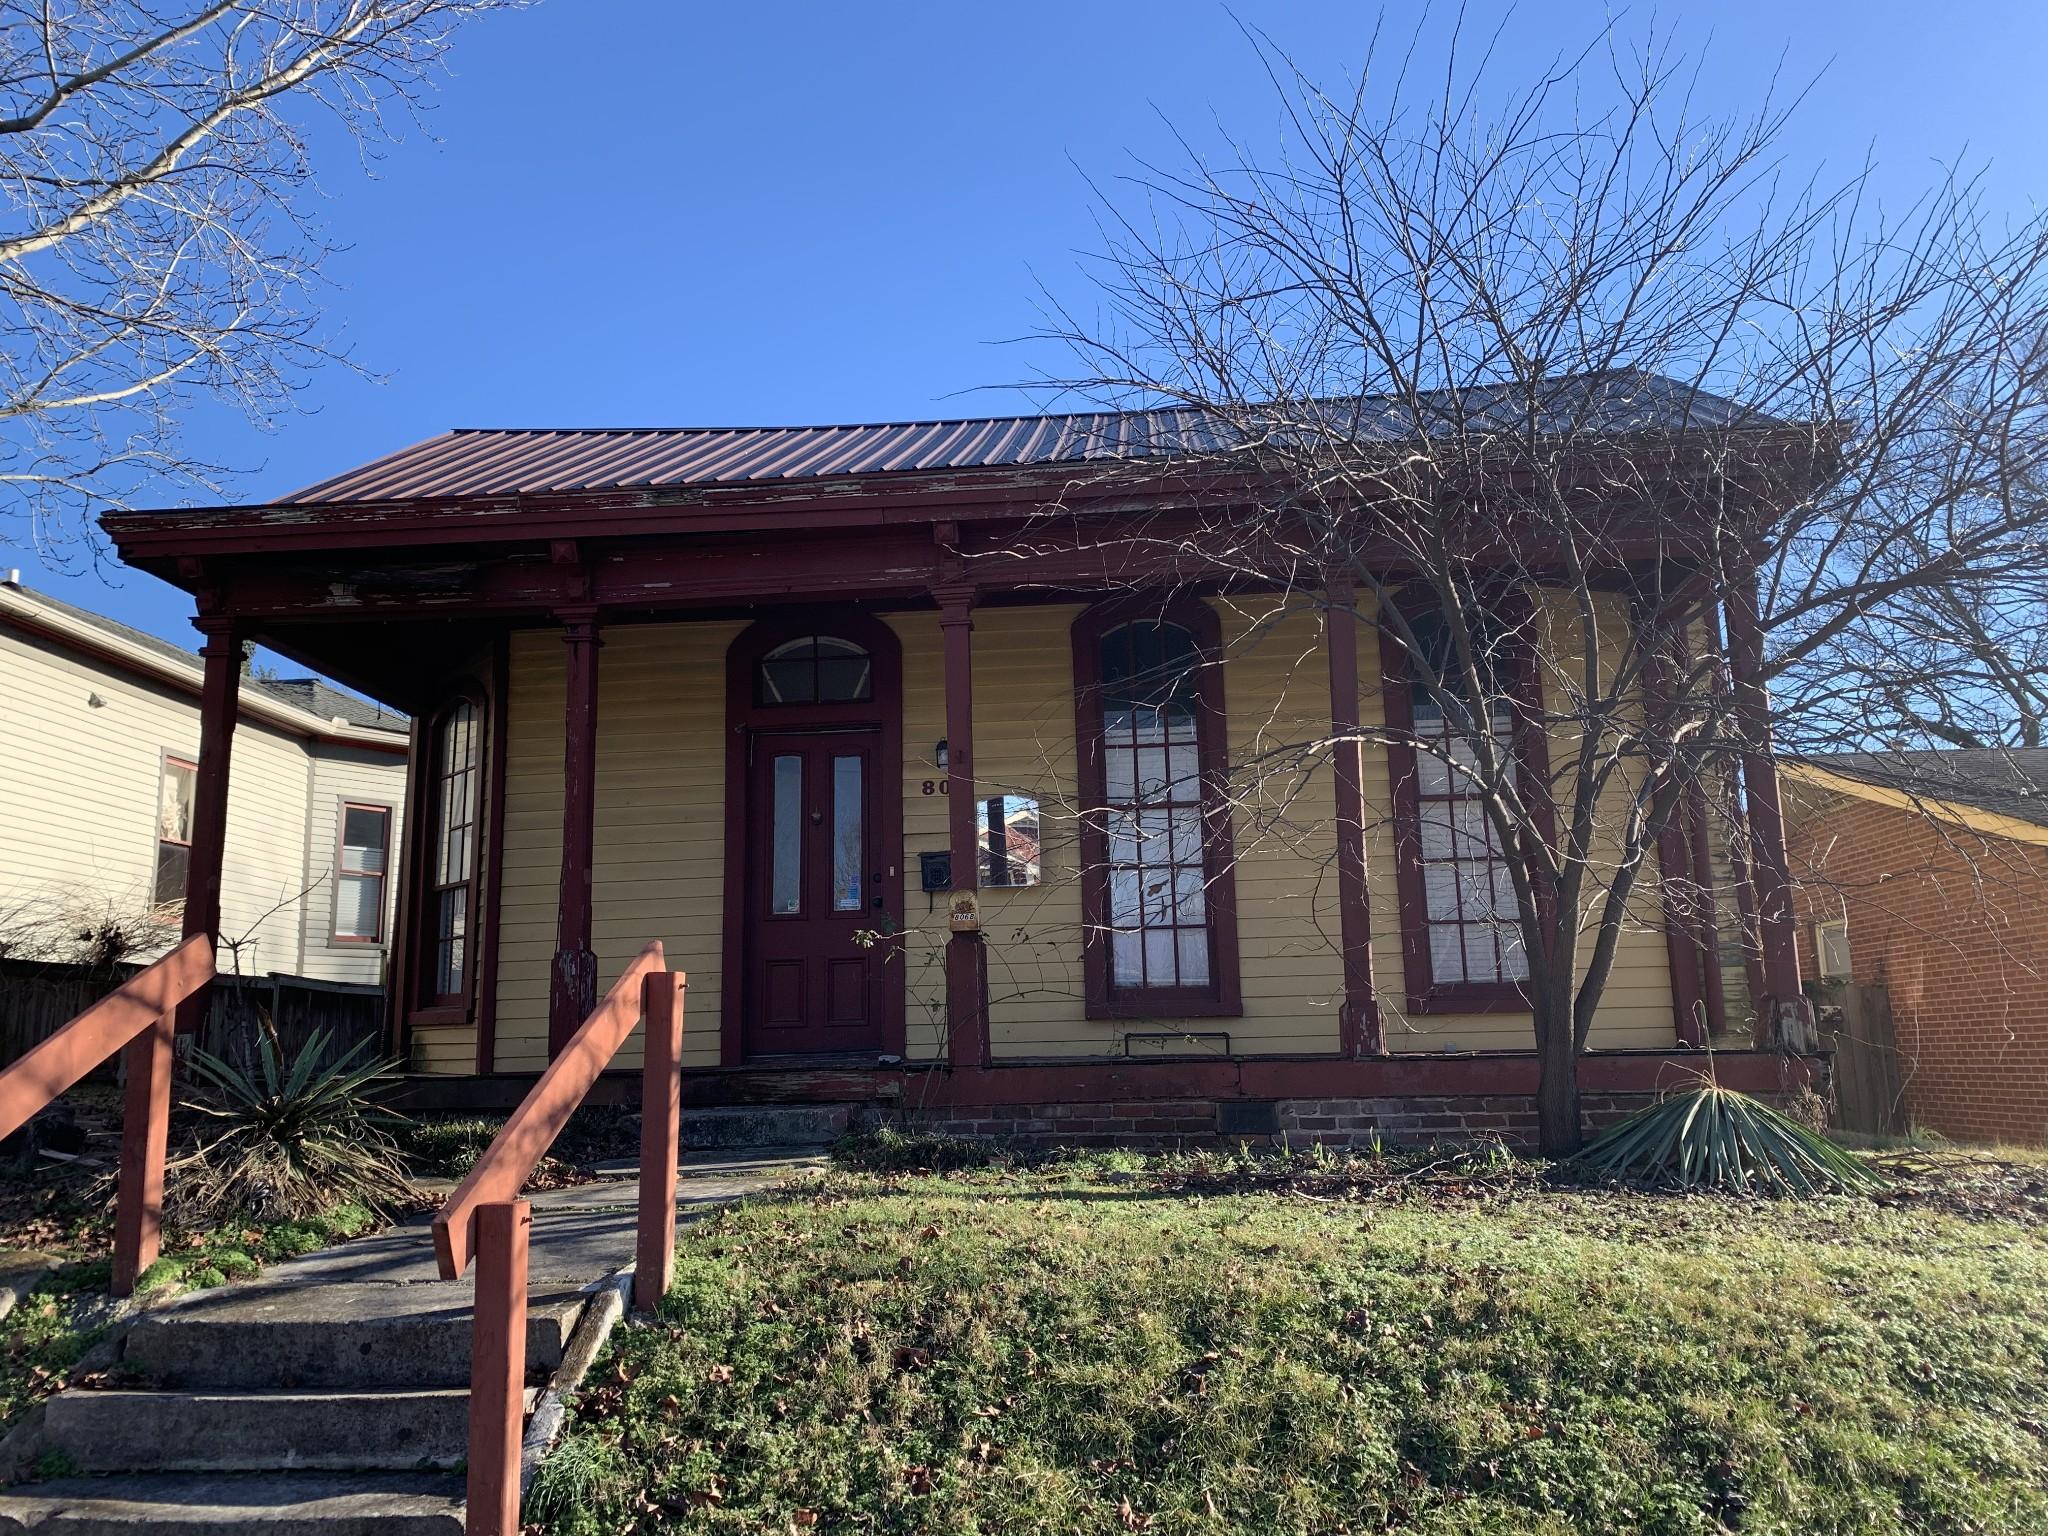 806 Boscobel St, Nashville, TN 37206 - Nashville, TN real estate listing